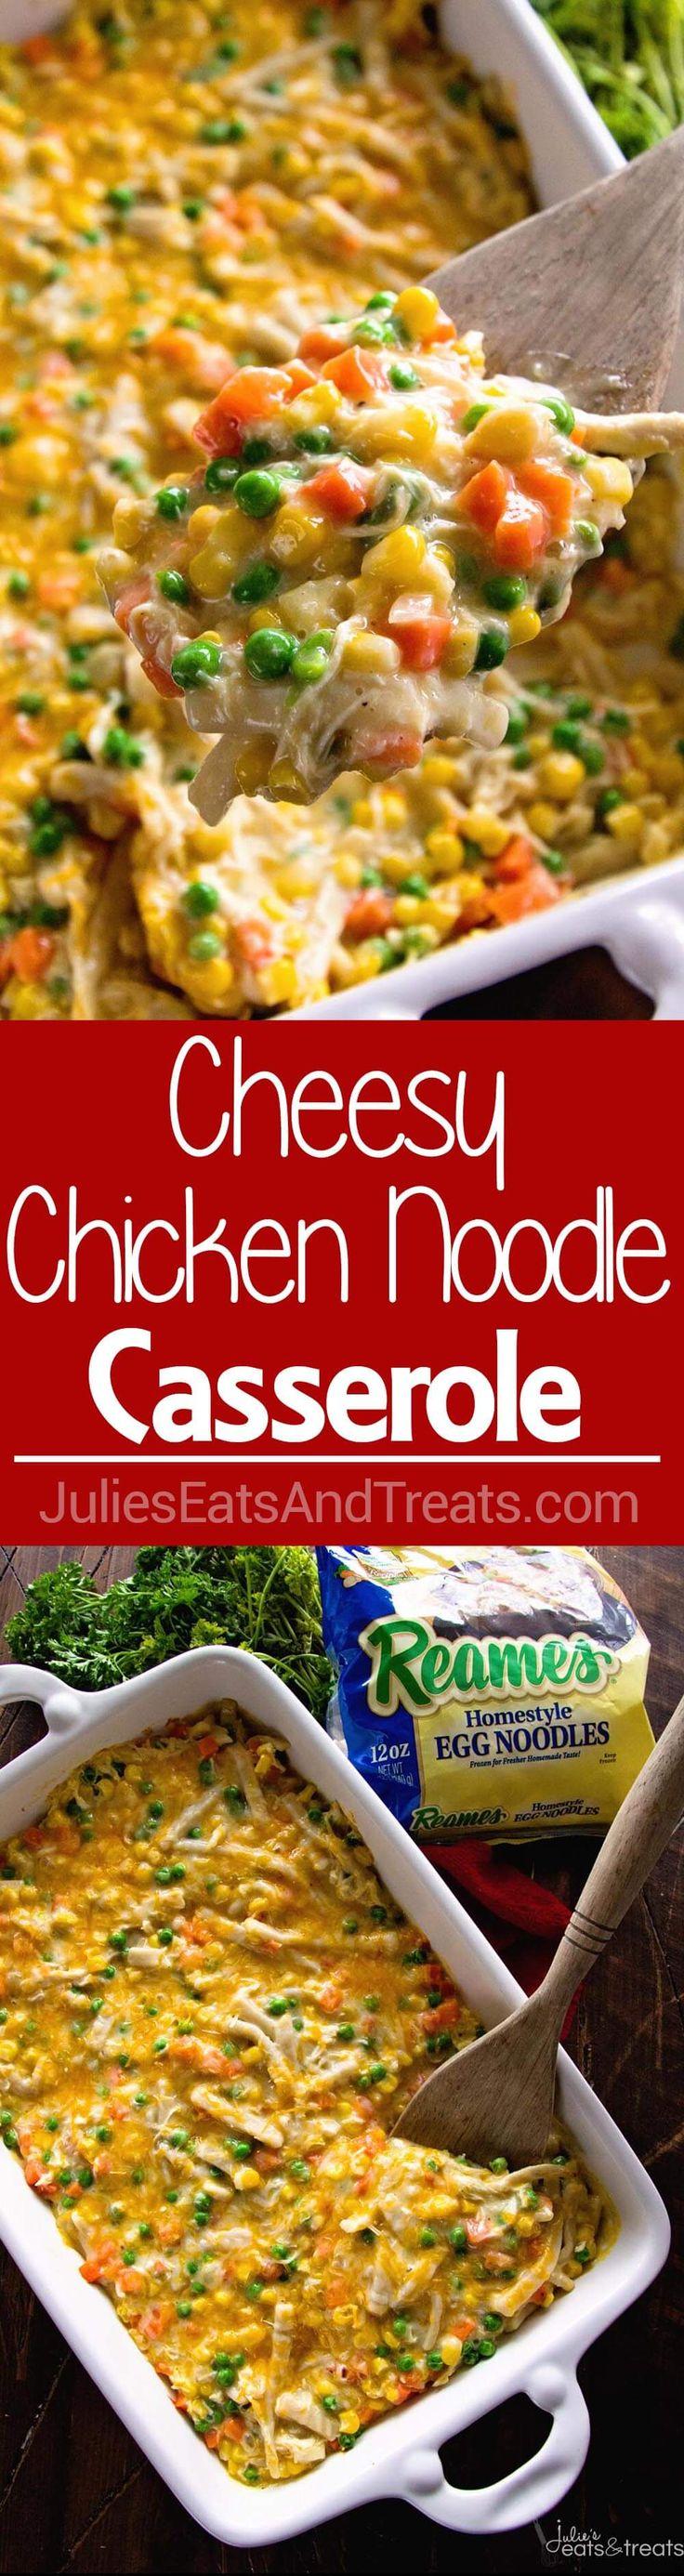 Cheesy Chicken Noodle Casserole